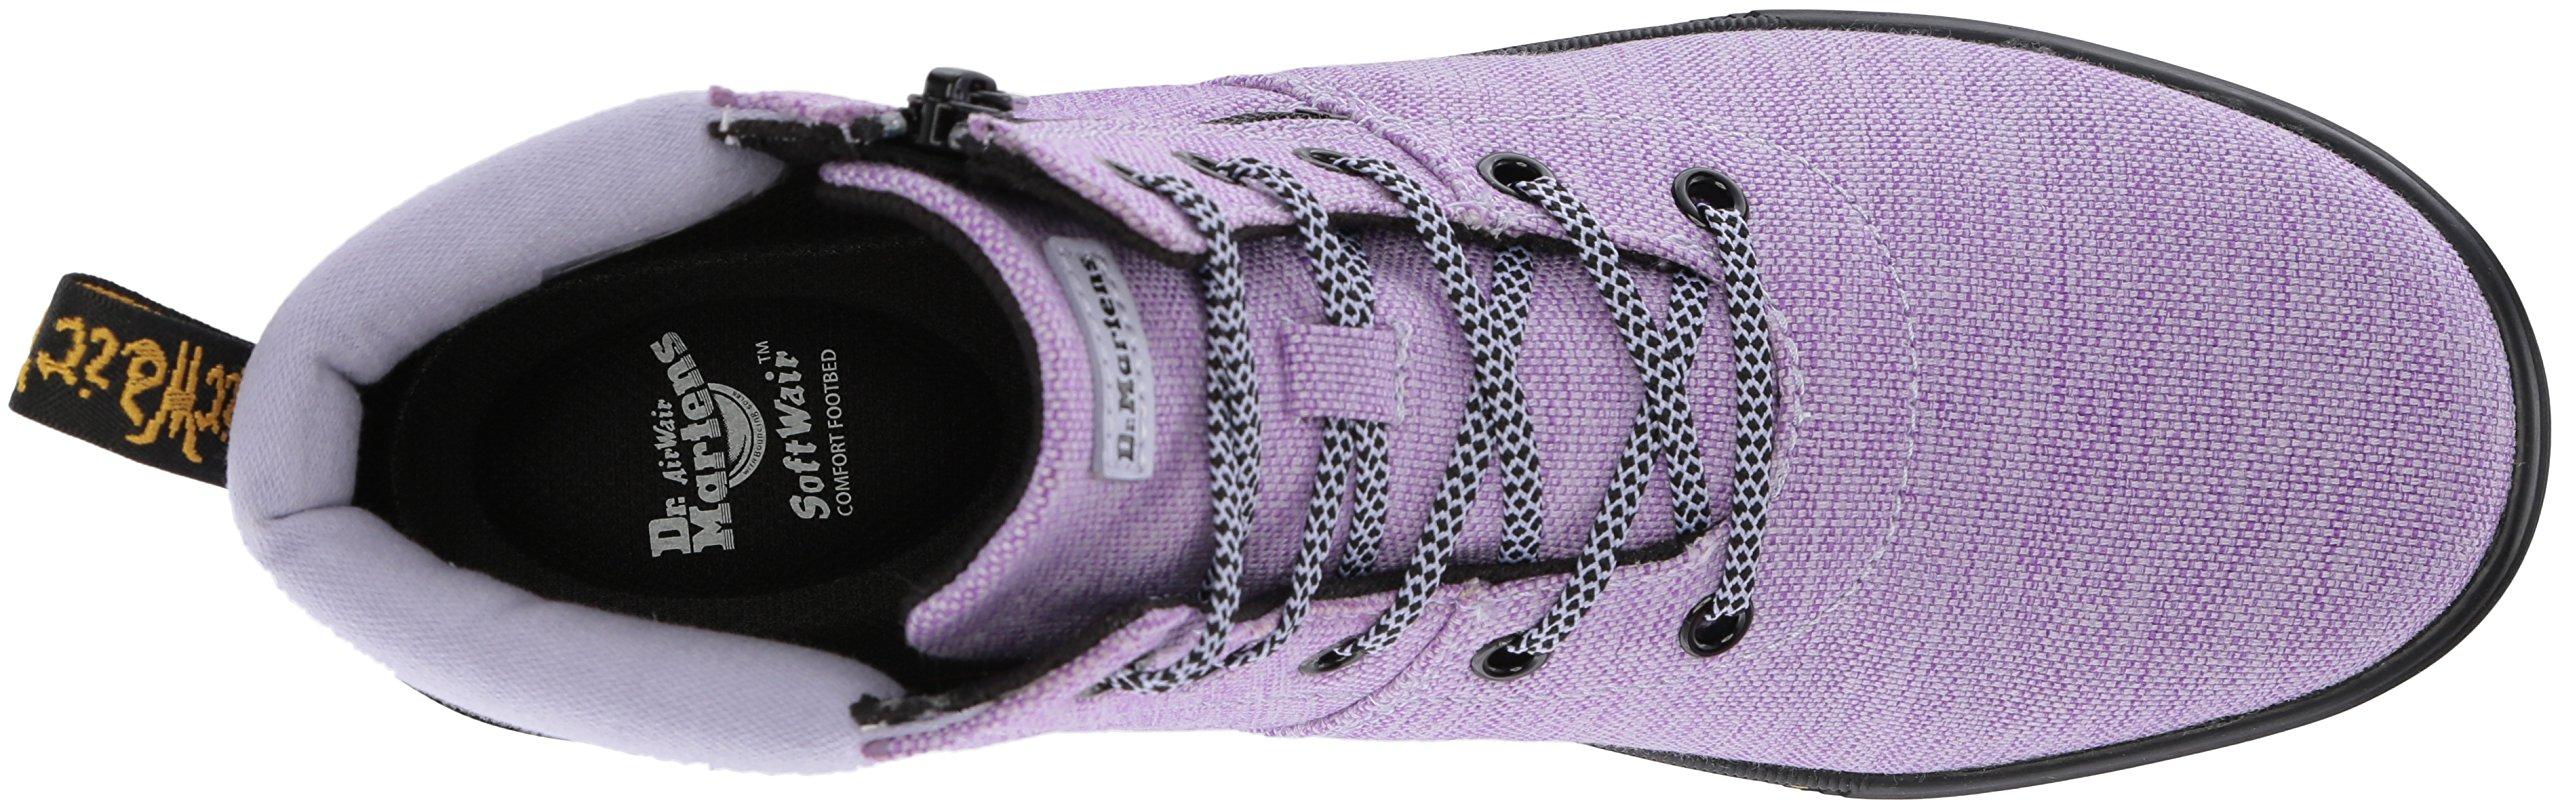 Dr. Martens Women's Maegley Fashion Boot, Purple Heather Woven Textile+Fine Canvas, 6 Medium UK (8 US) by Dr. Martens (Image #7)